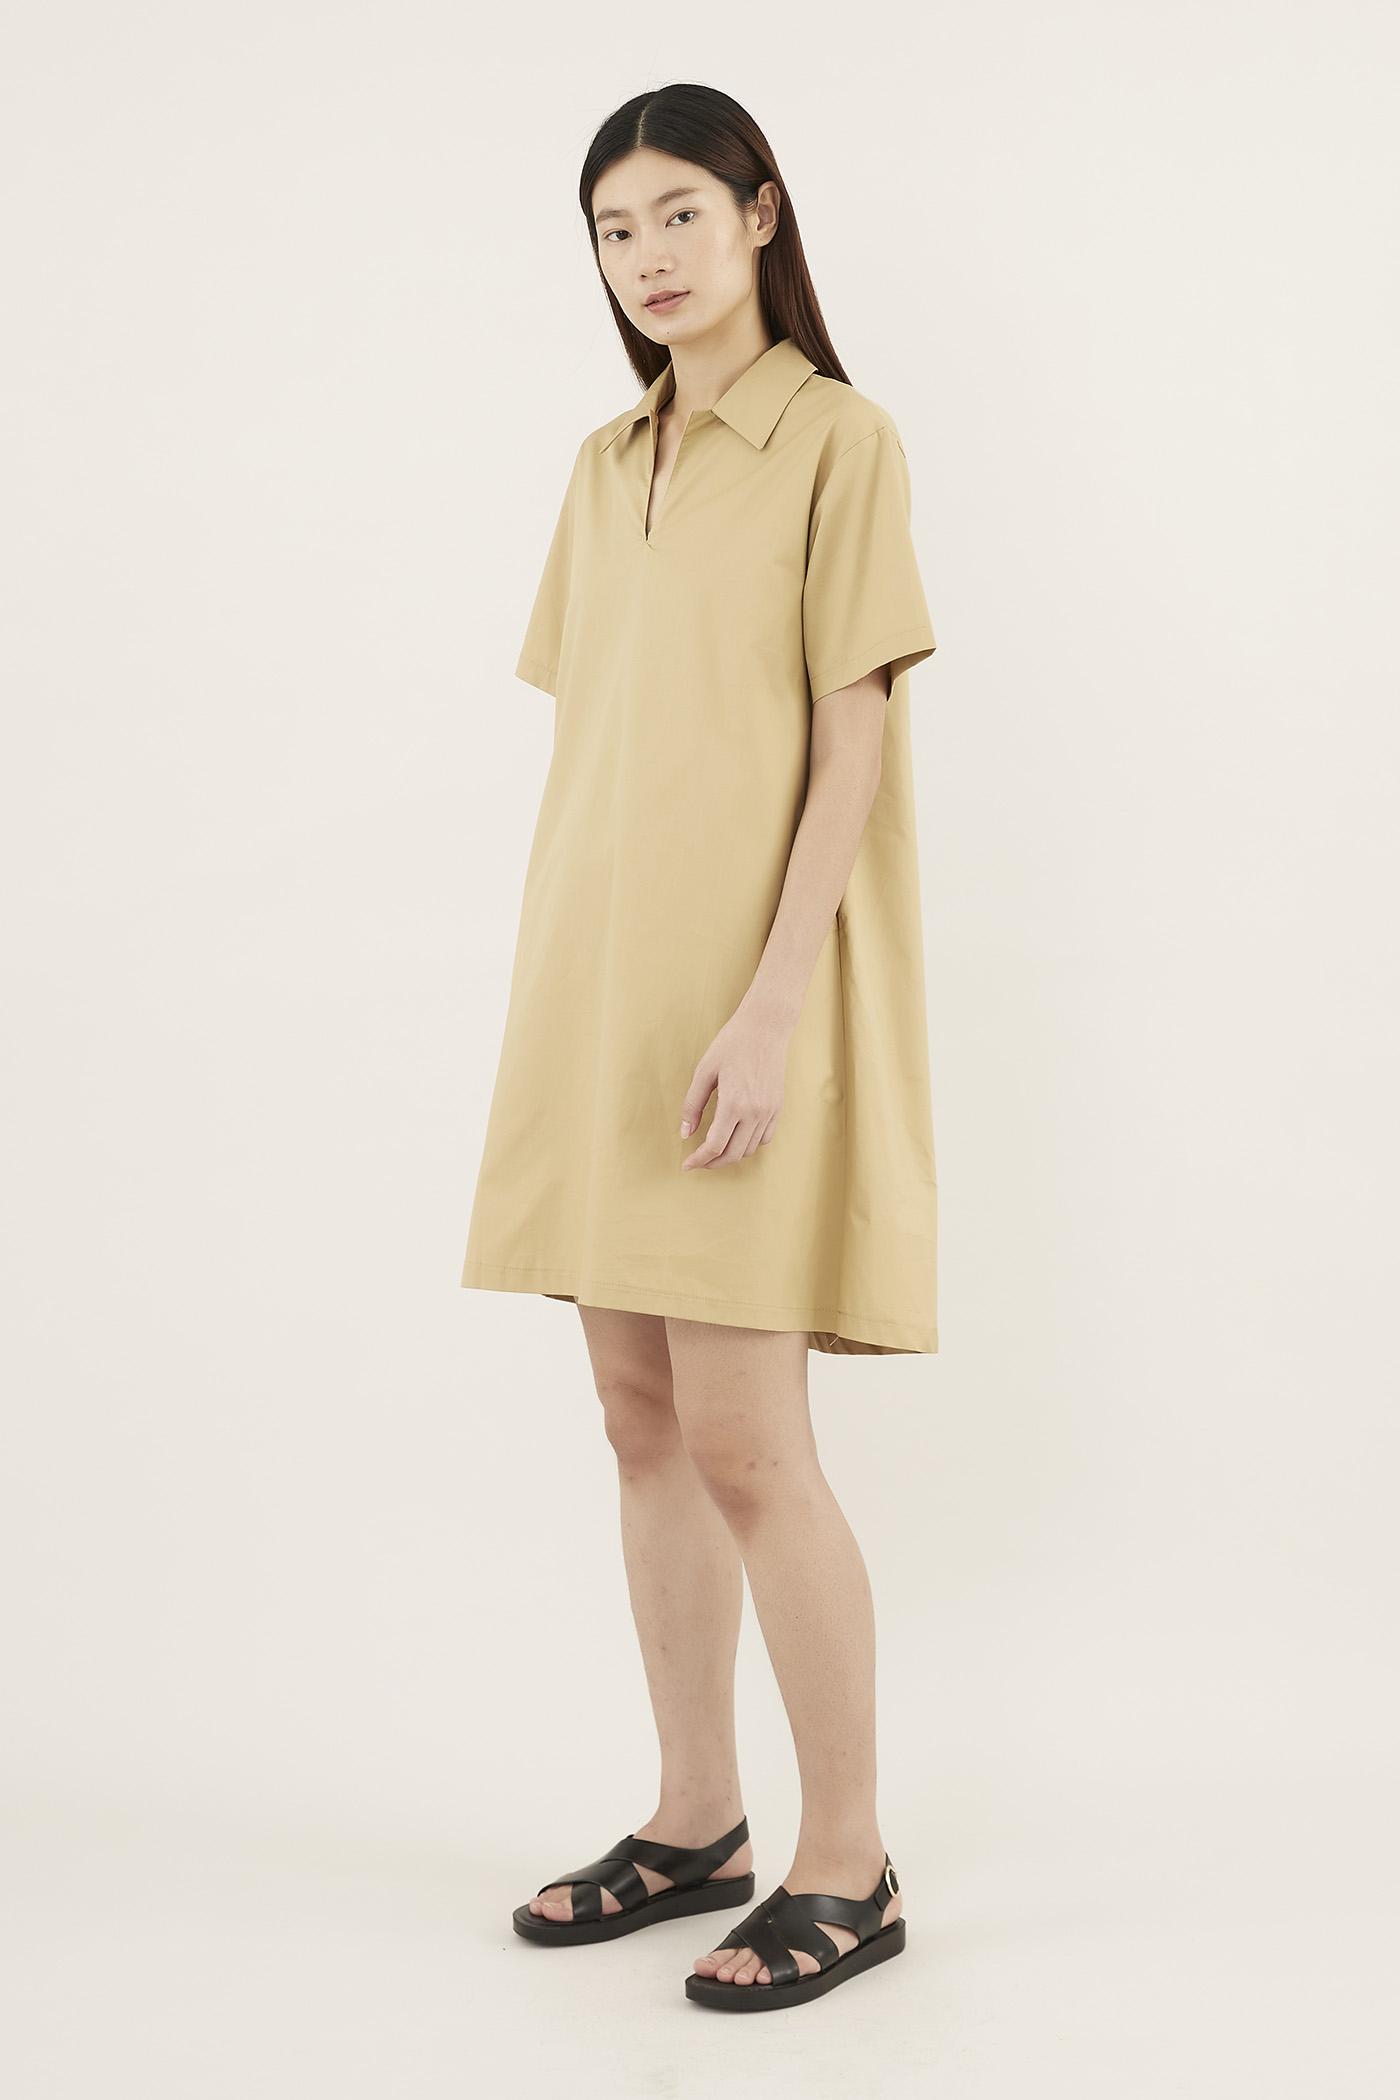 Clarice Oversized Dress